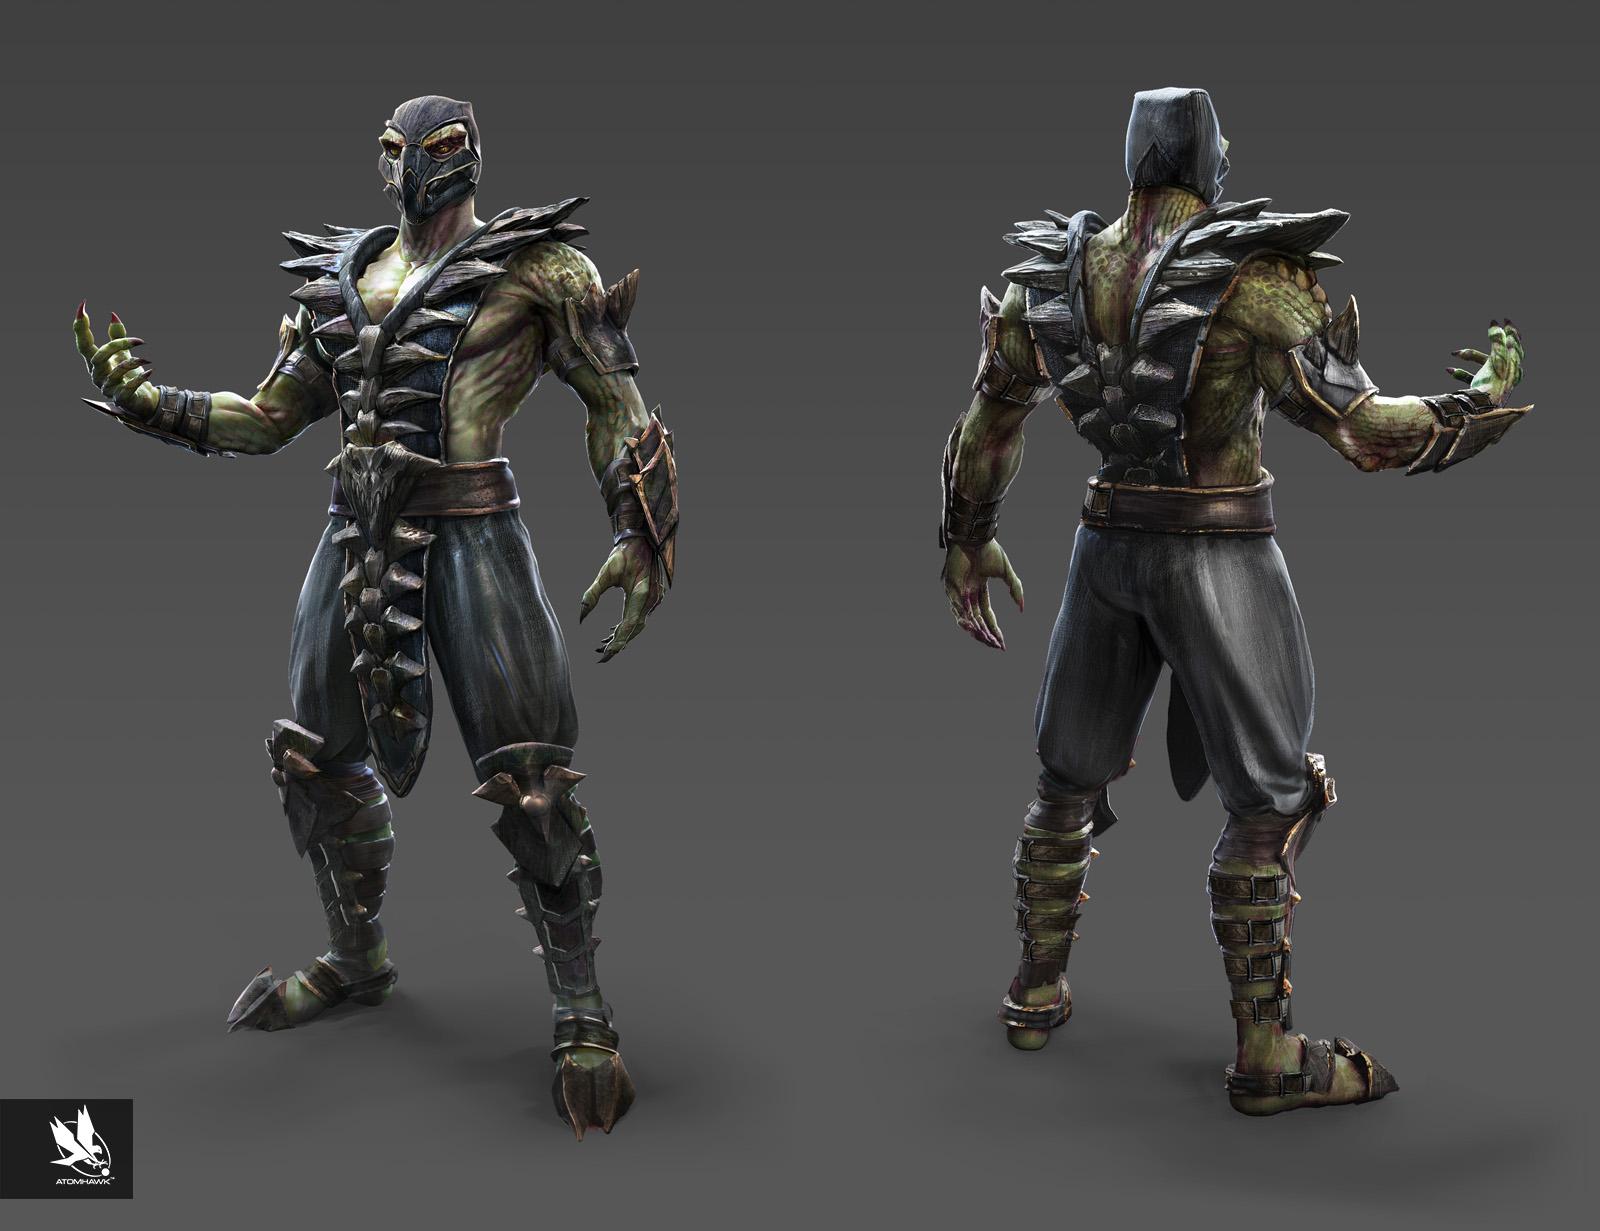 Atomhawk_WarnerBrosNetherRealm_MortalKombat_ConceptArt_CharacterDesign_Reptile.jpg